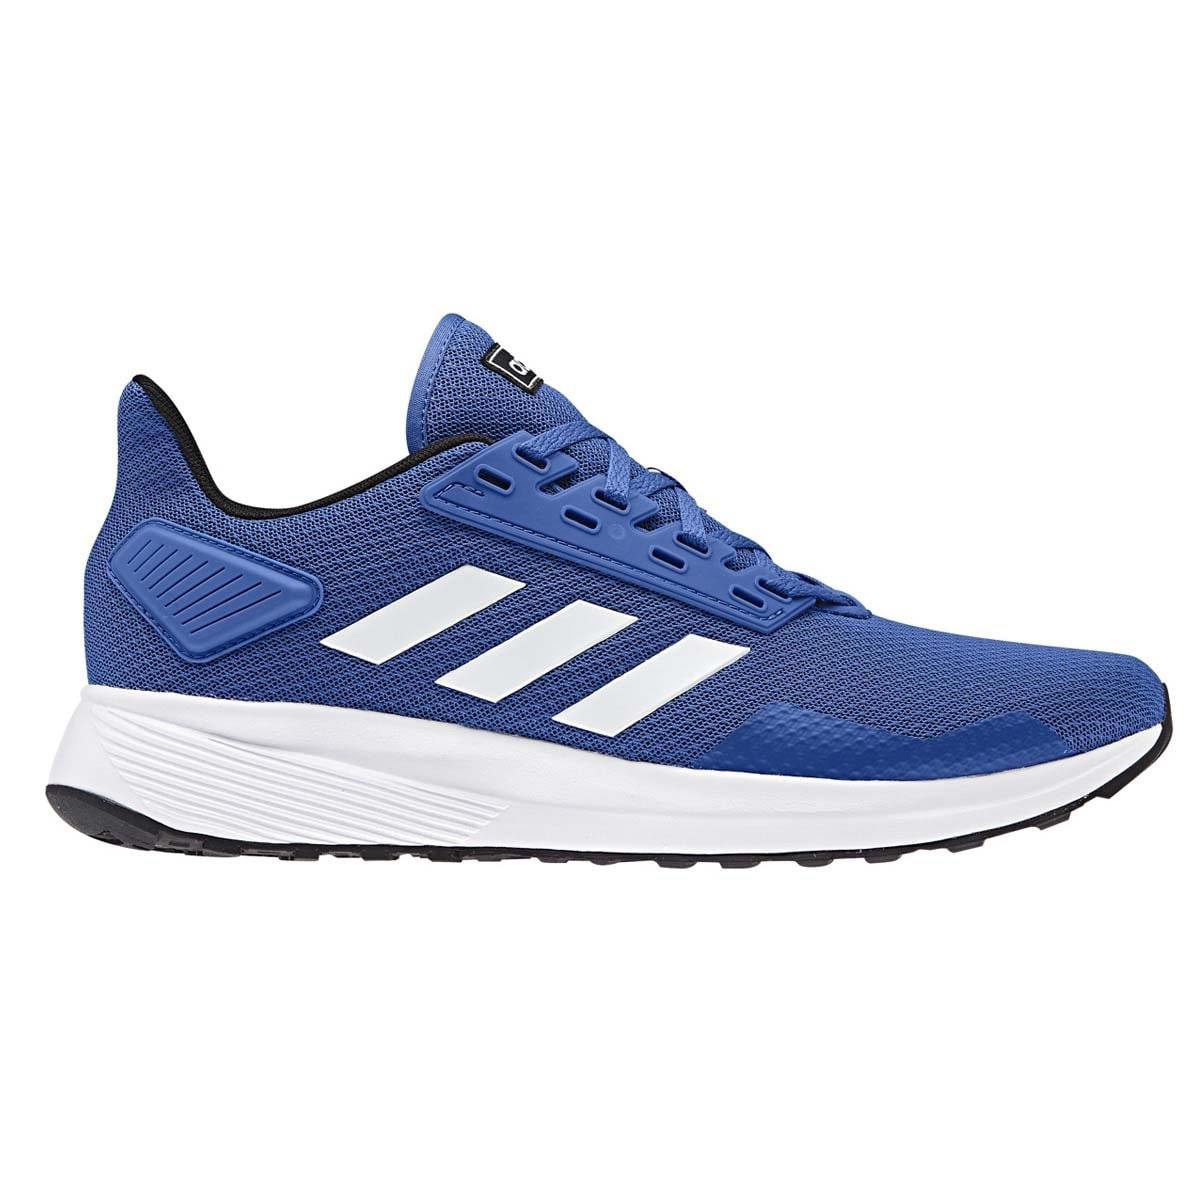 Tenis Running Duramo 9 Adidas - Caballero